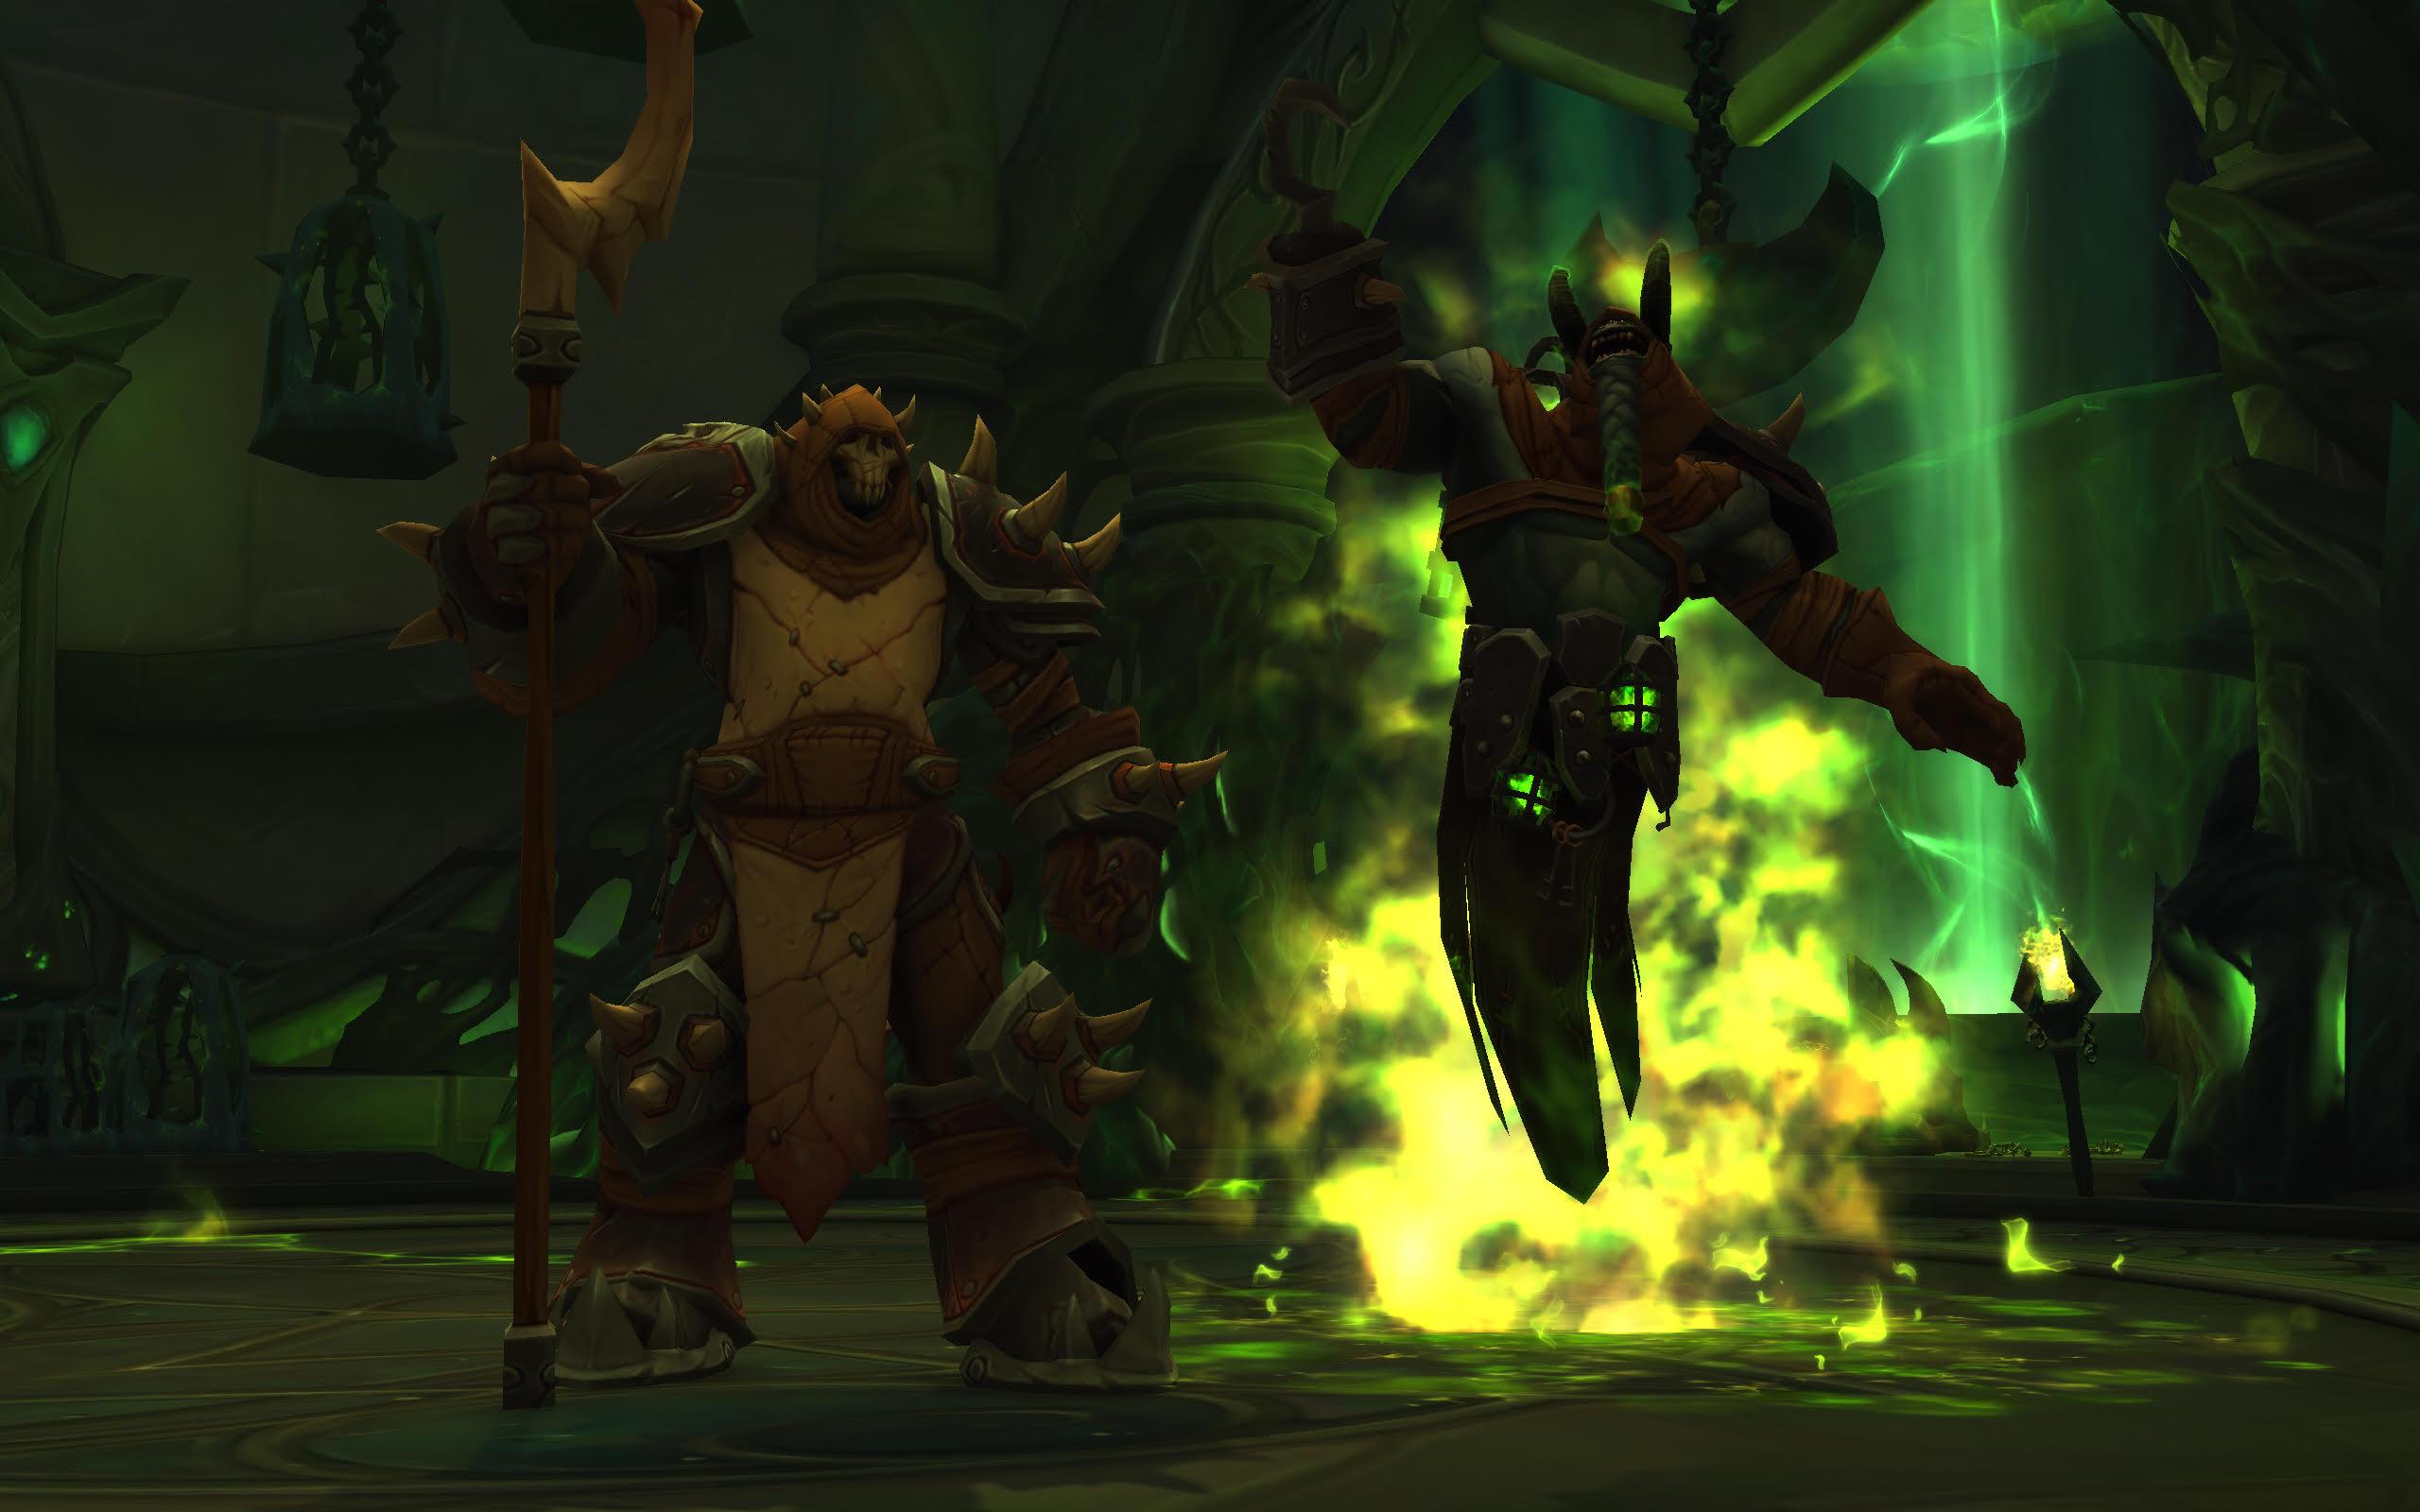 A raid boss from World of Warcraft